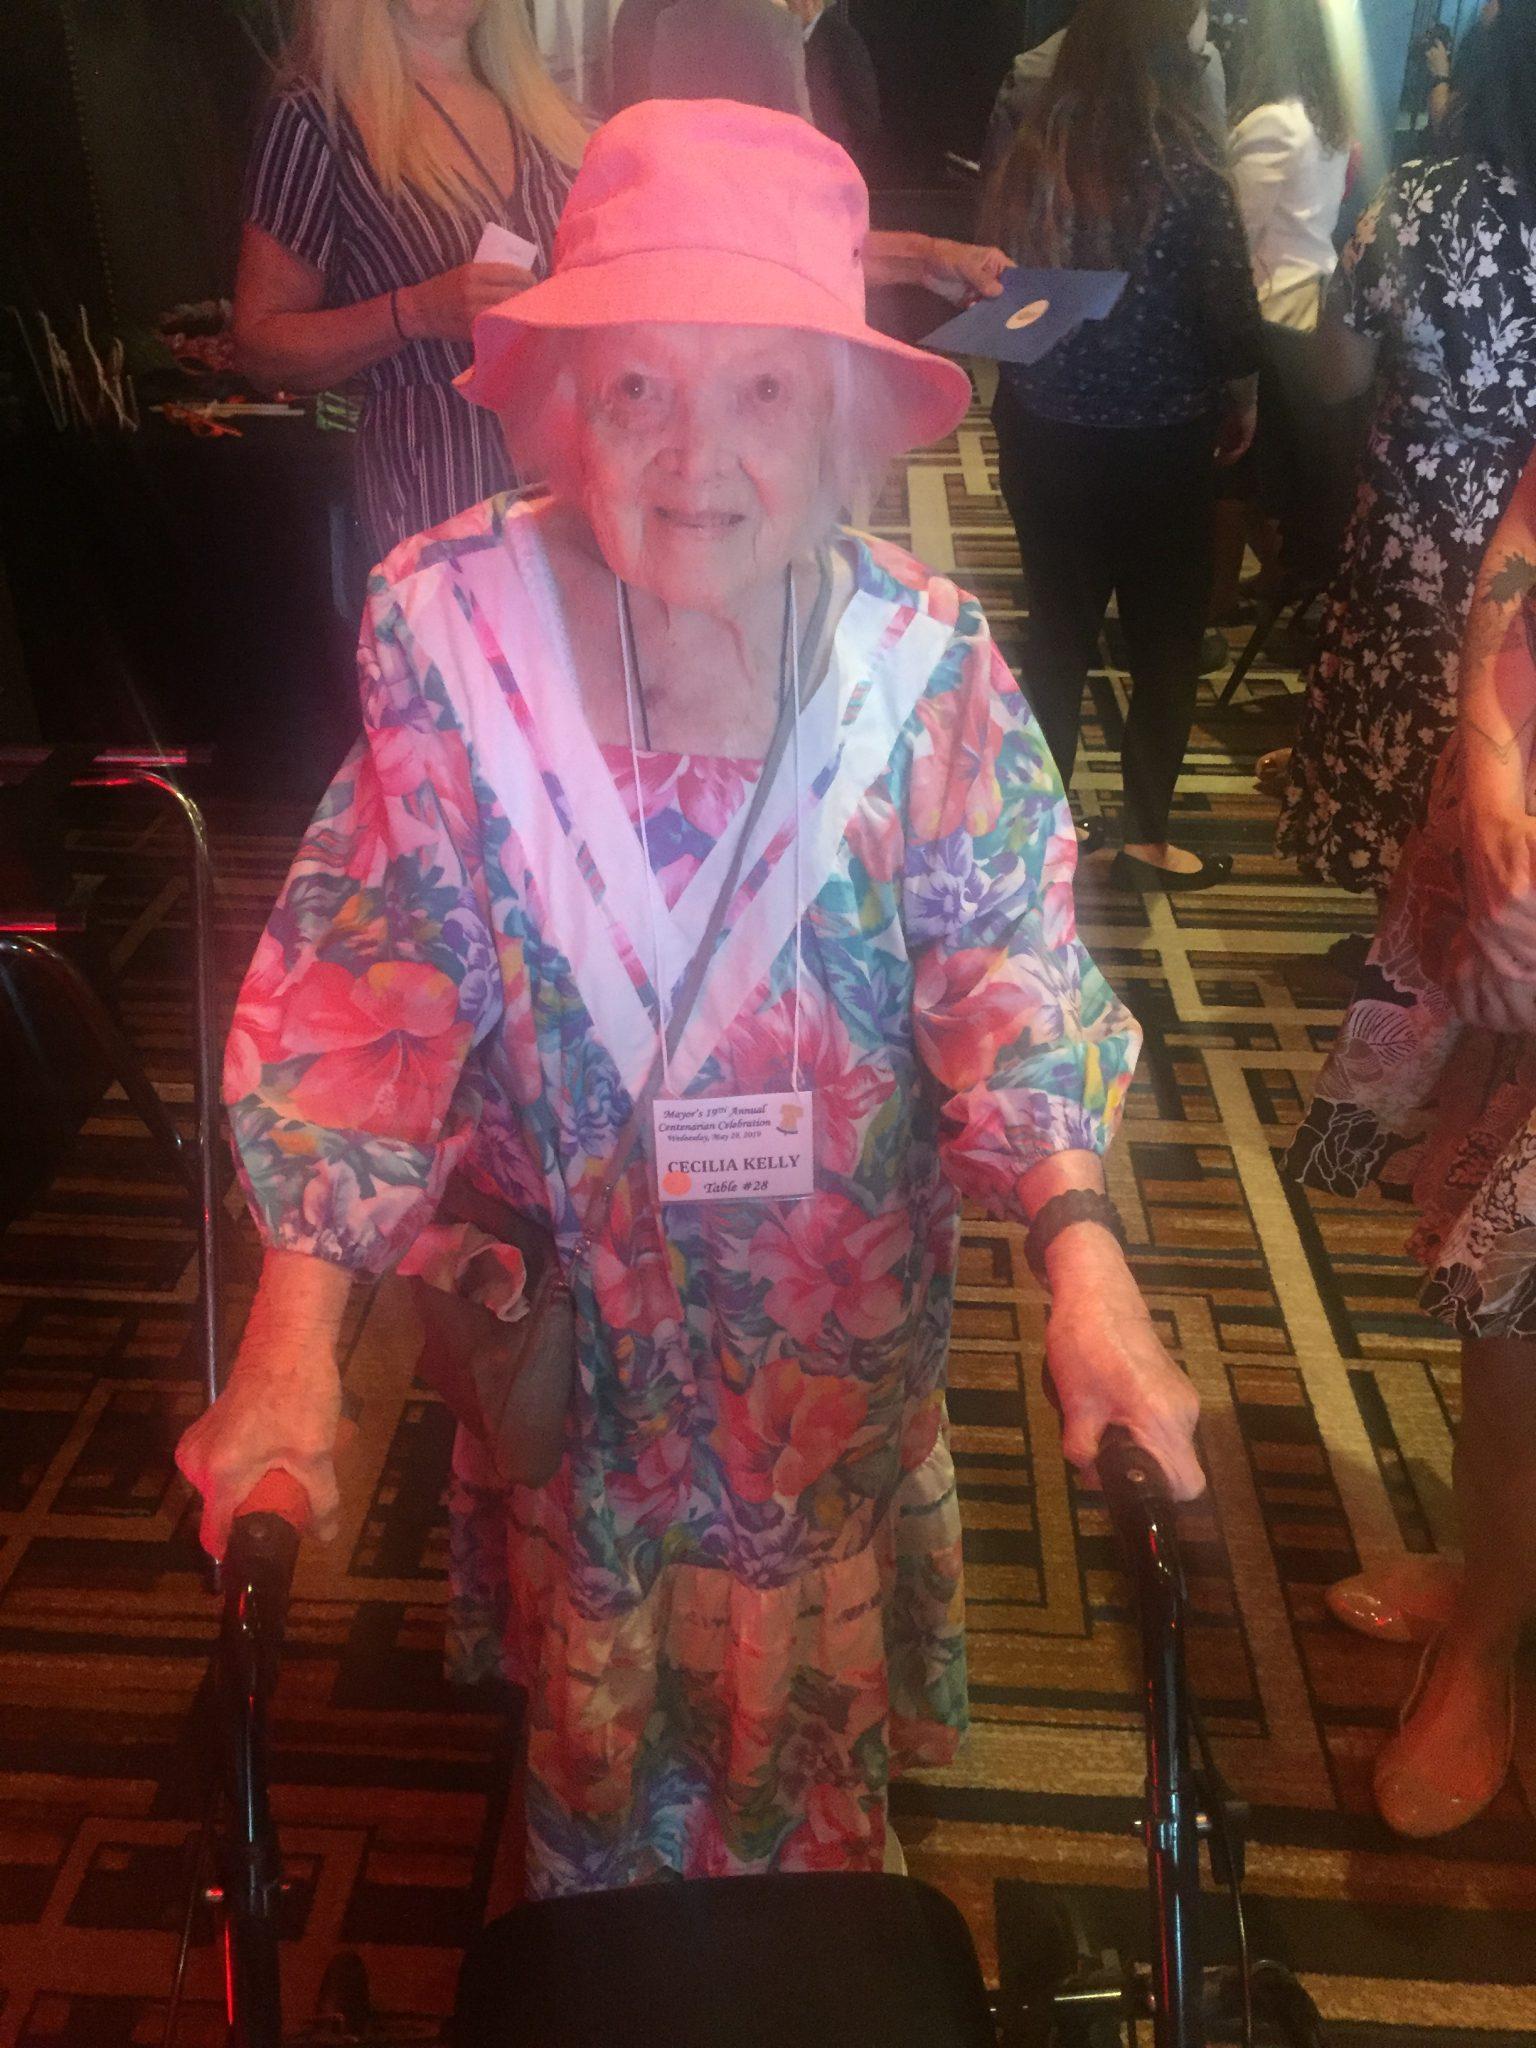 A celebration of Philadelphia's centenarians